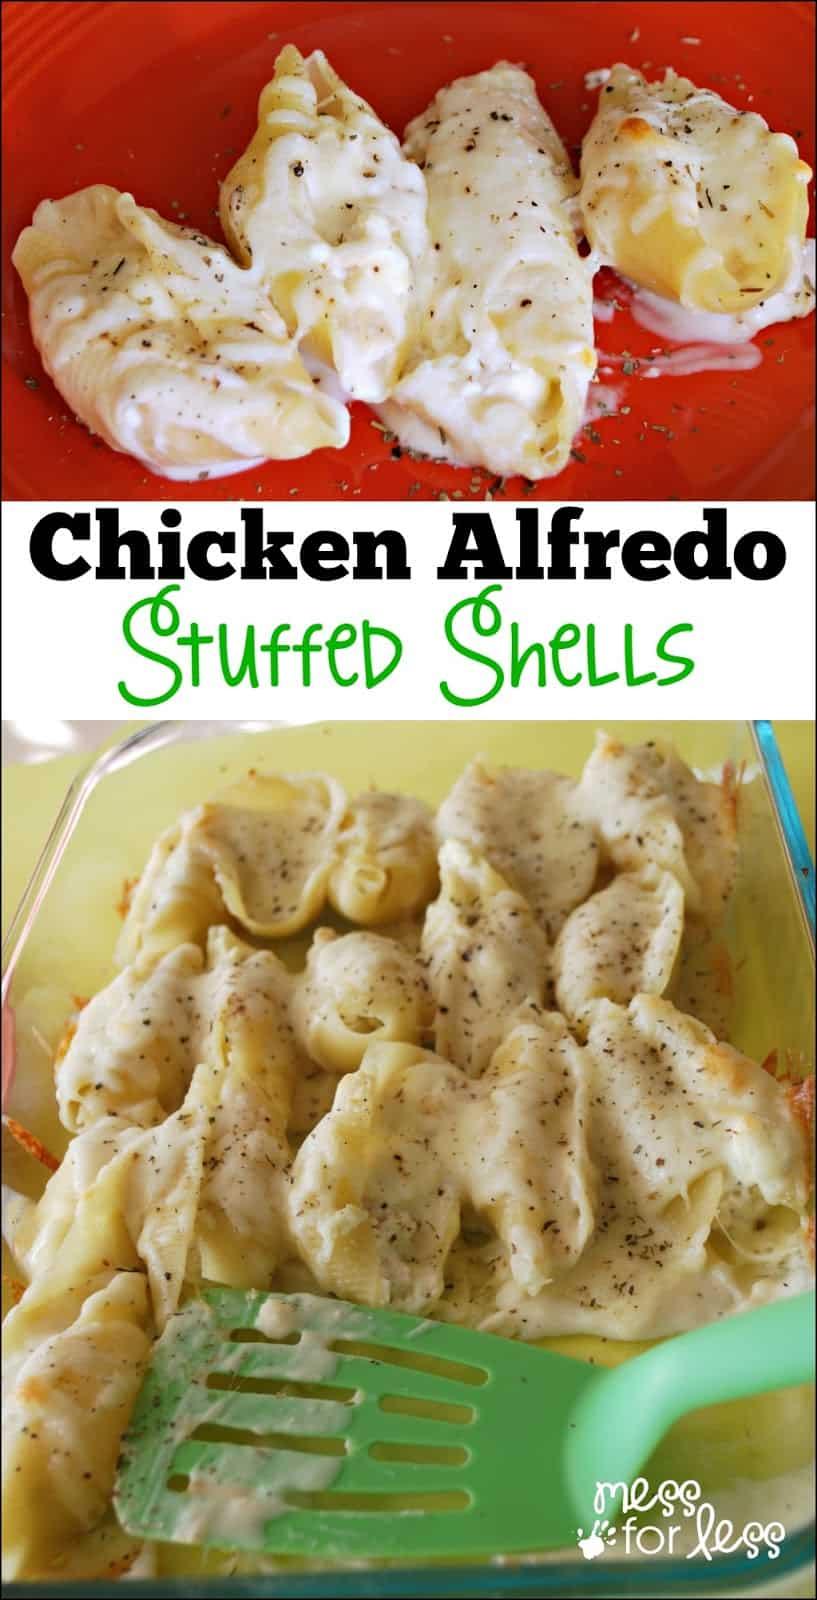 Chicken Alfredo Stuffed Shells  Yummy Twist On Traditional Stuffed Shells  Recipefort Food At